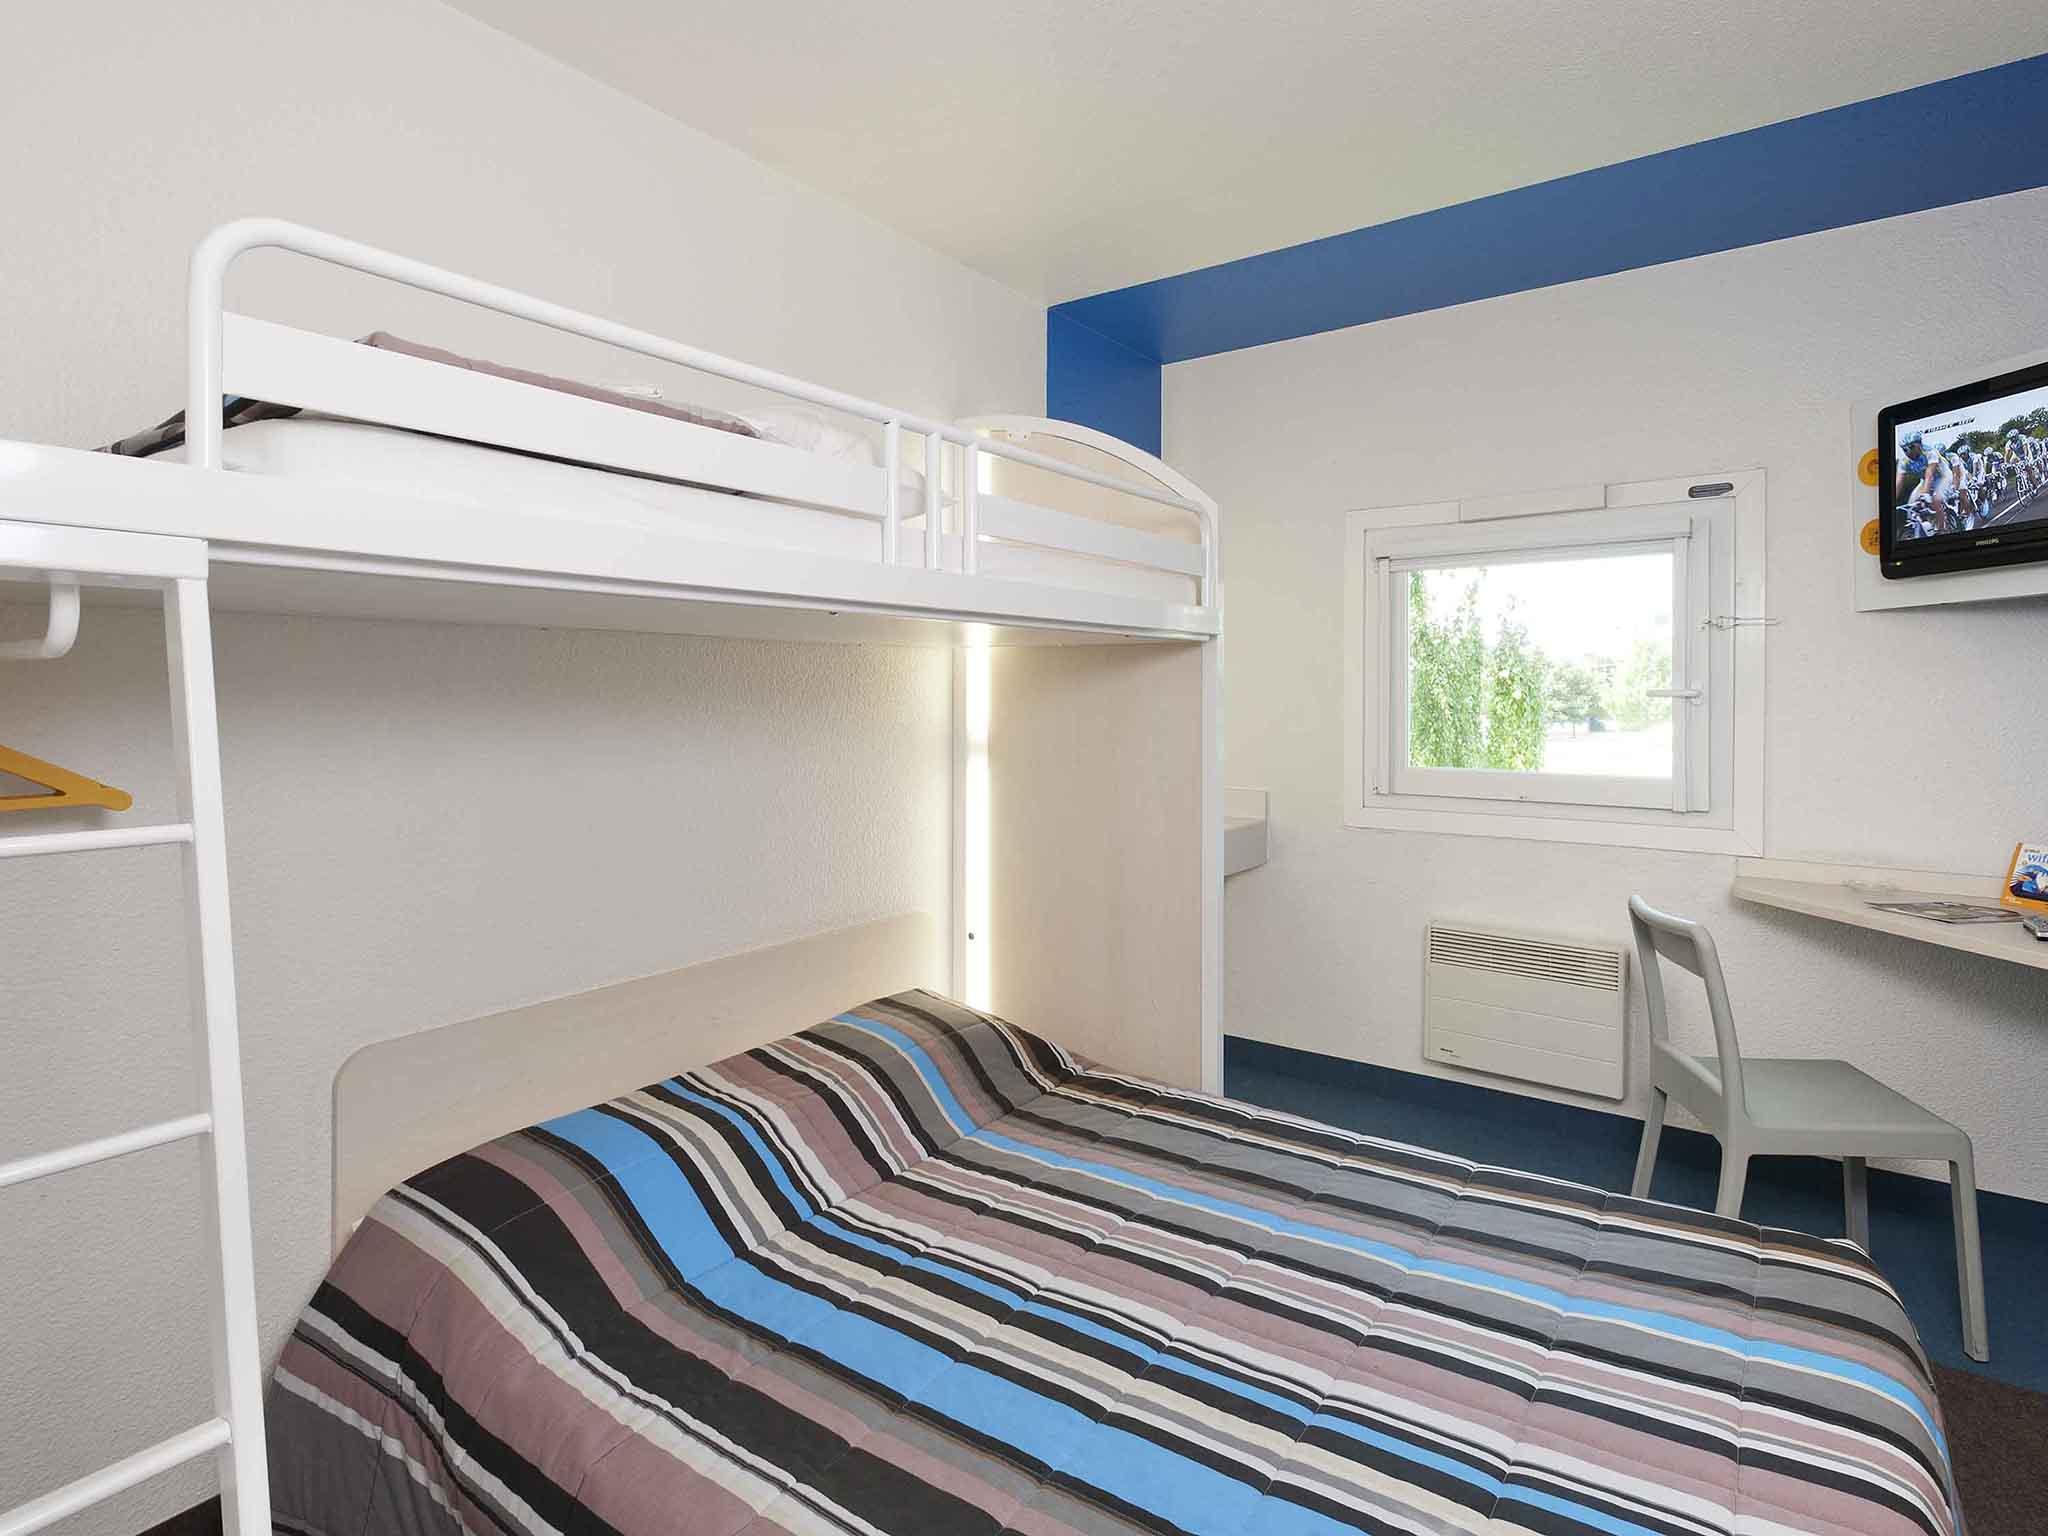 Hotell – hotelF1 Pontarlier